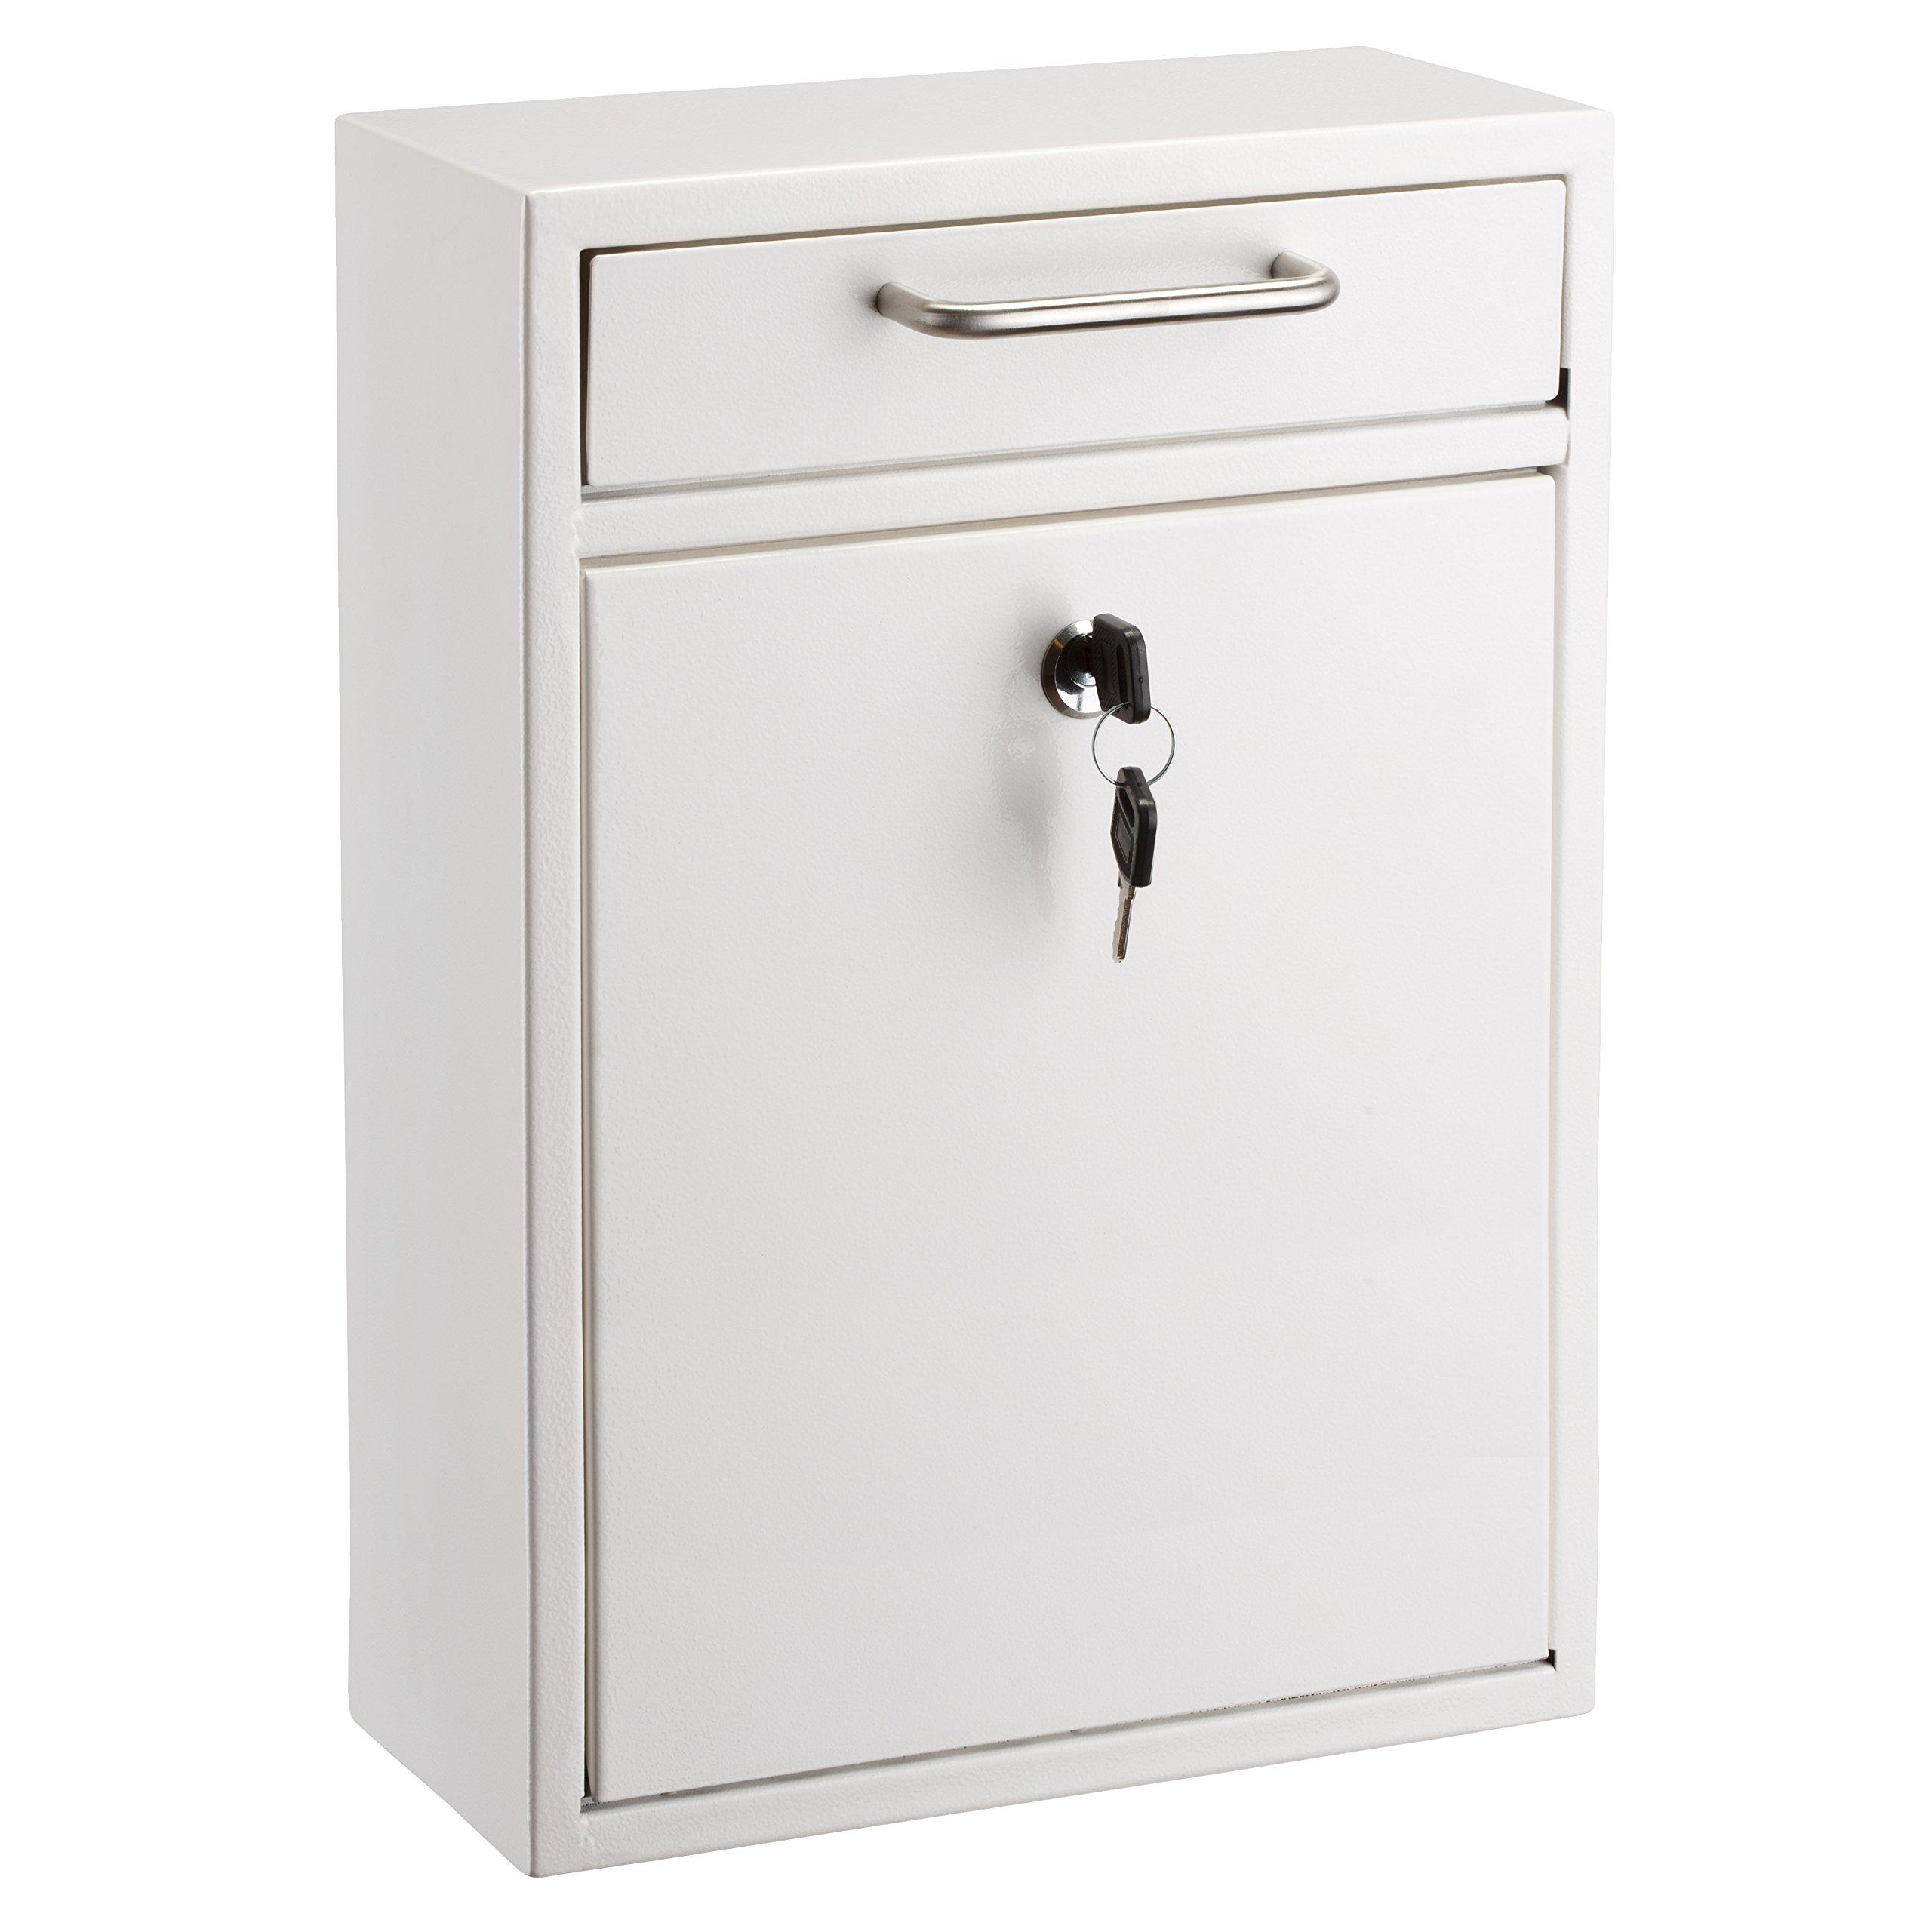 AdirOffice Locking Drop Box – Wall Mounted Mailbox – (Large, White)